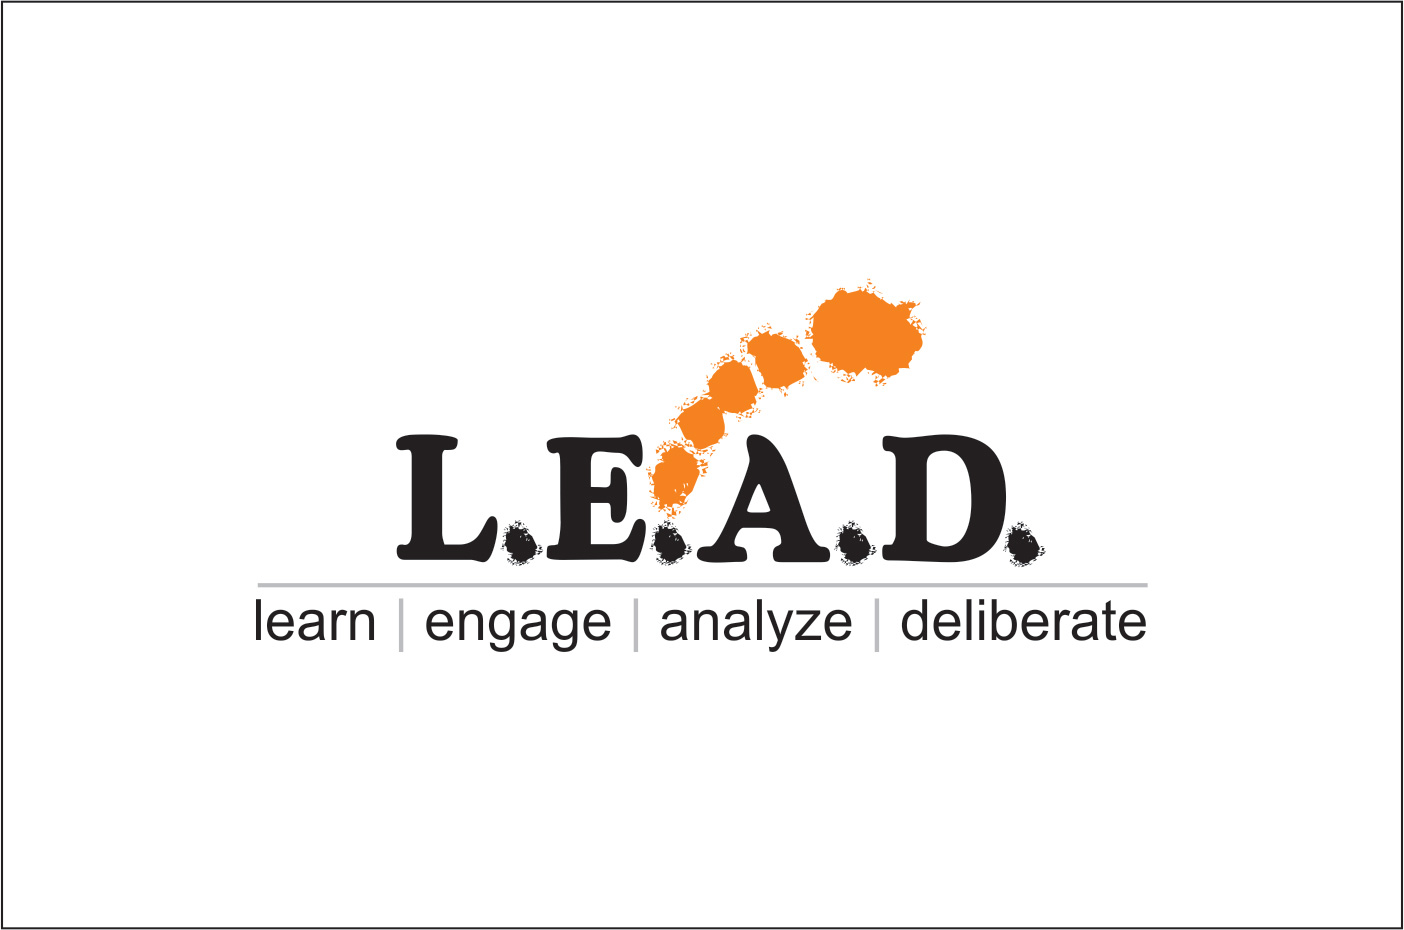 Logo Design by Rai - Entry No. 41 in the Logo Design Contest L.E.A.D. (learn, engage, analyze, deliberate) Logo Design.